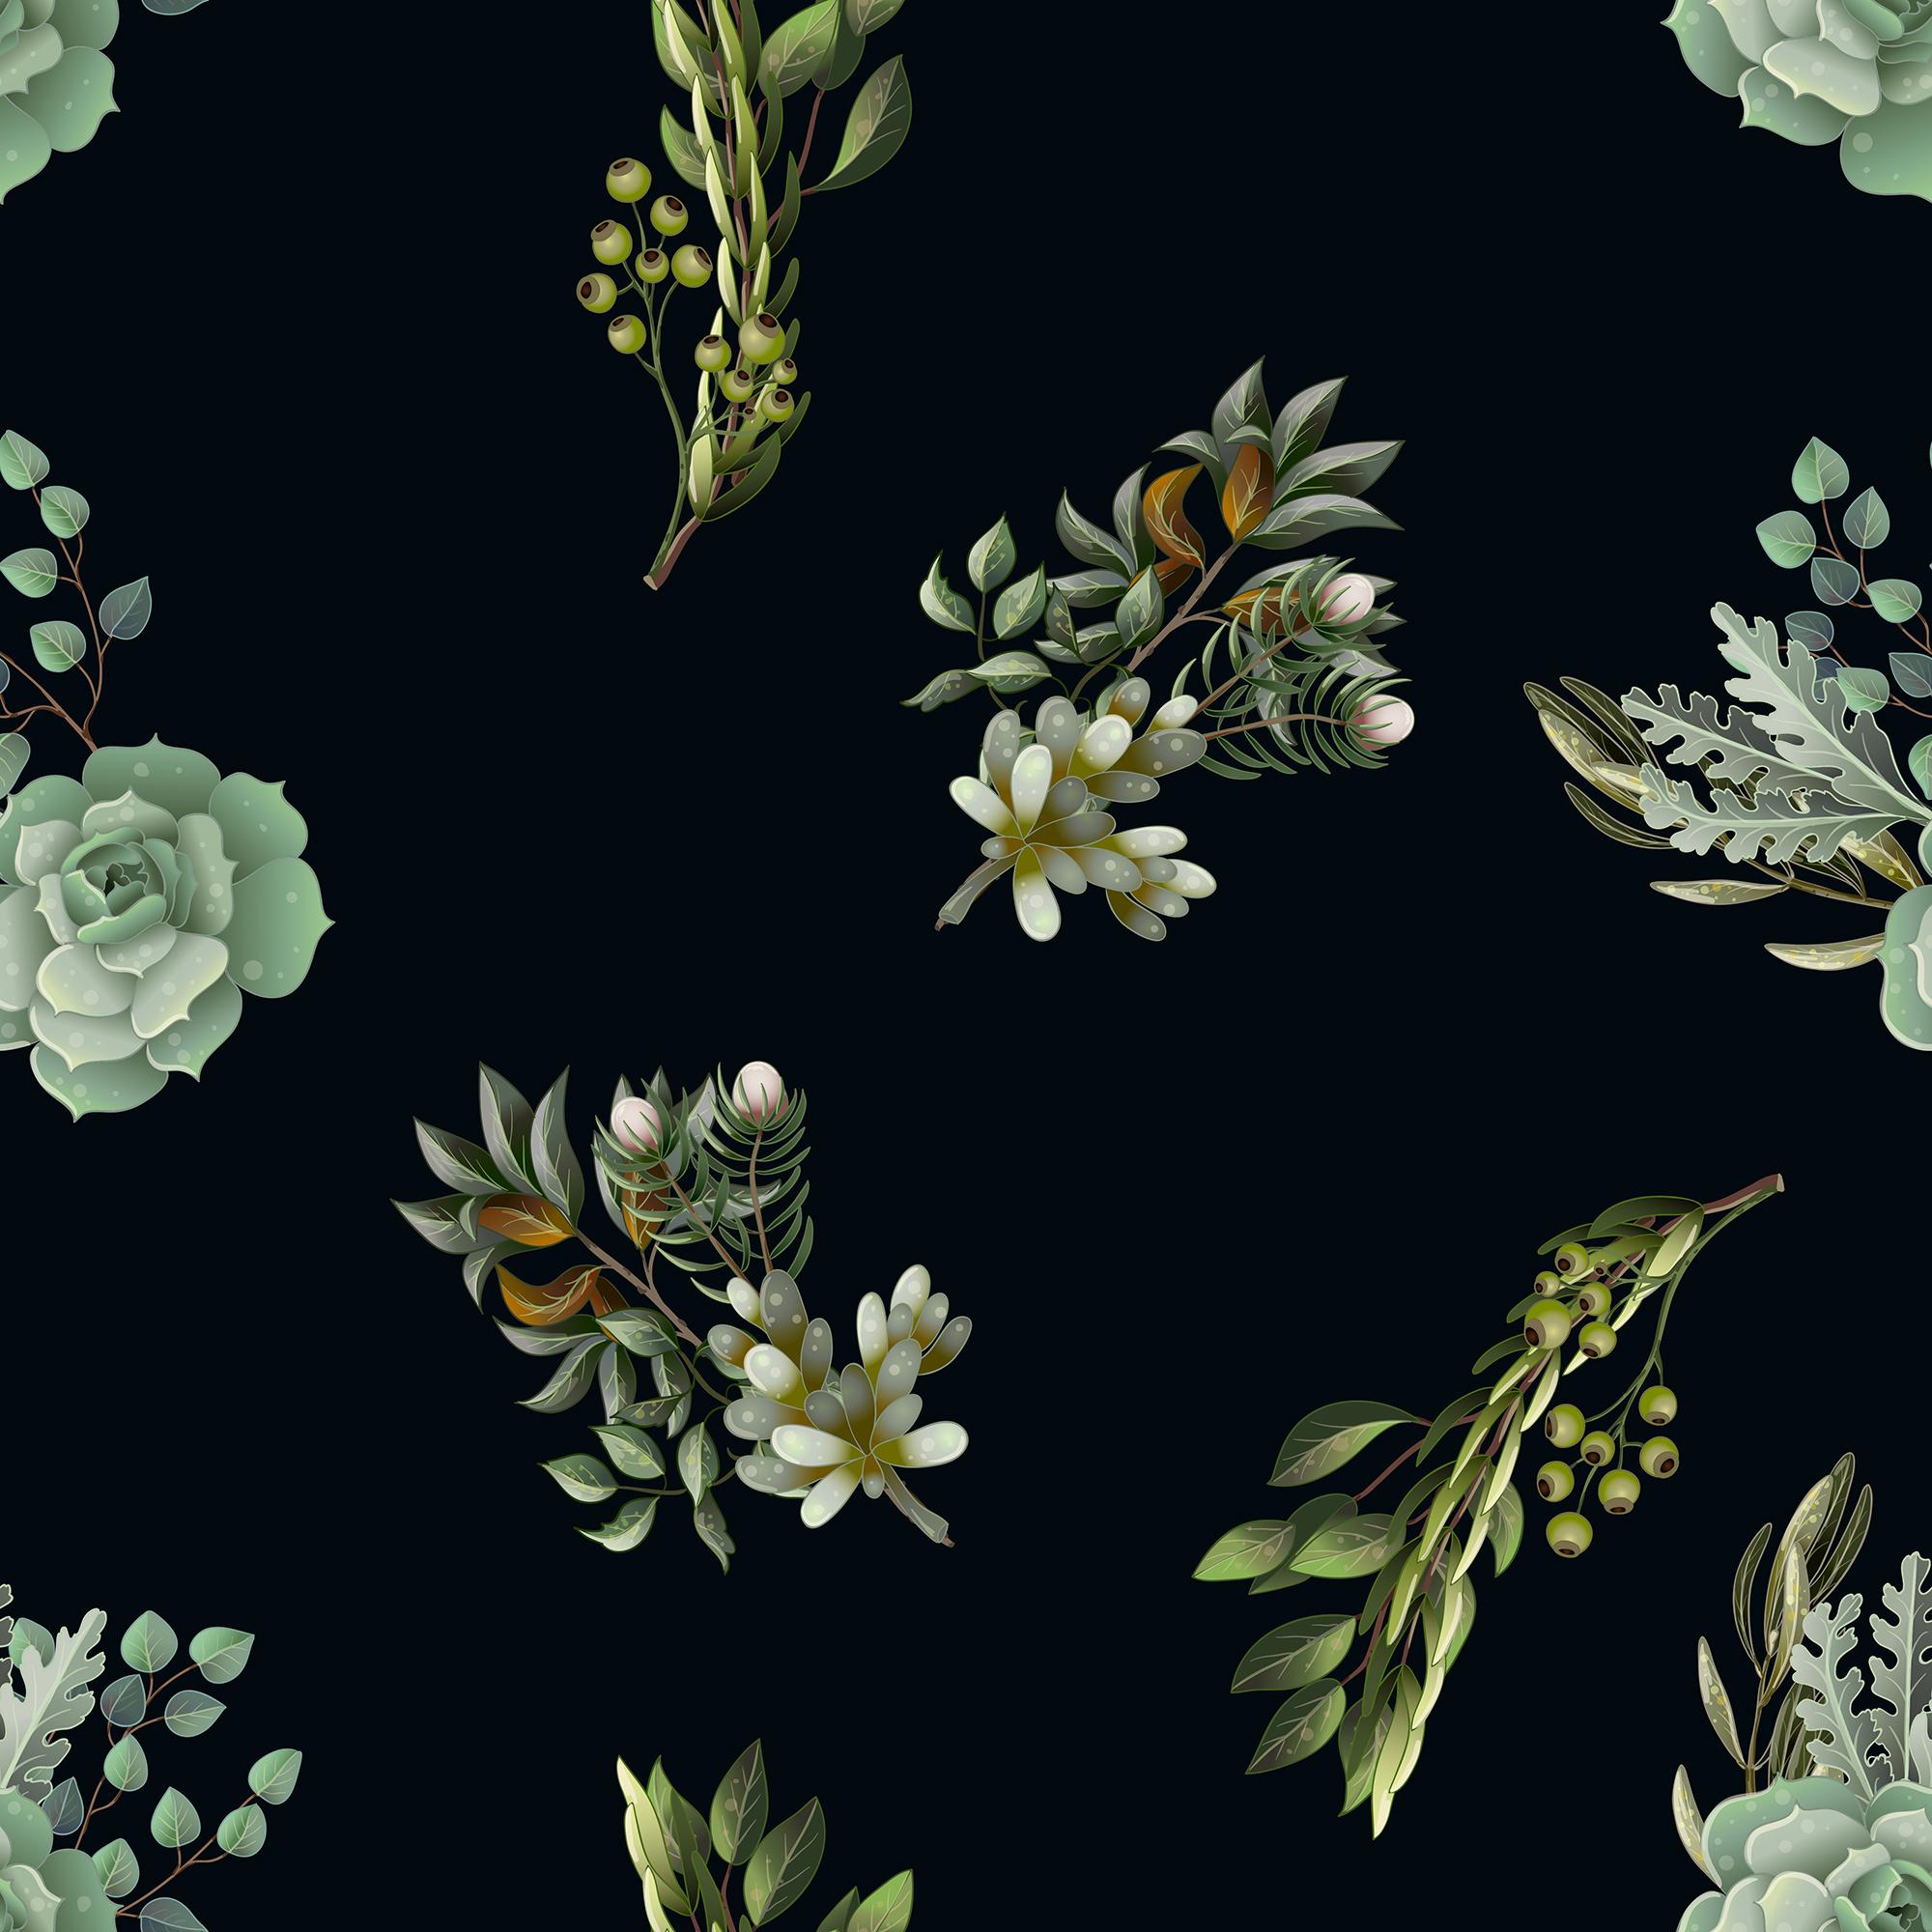 Wedding greenery invitation, patterns and isolated elements example image 8